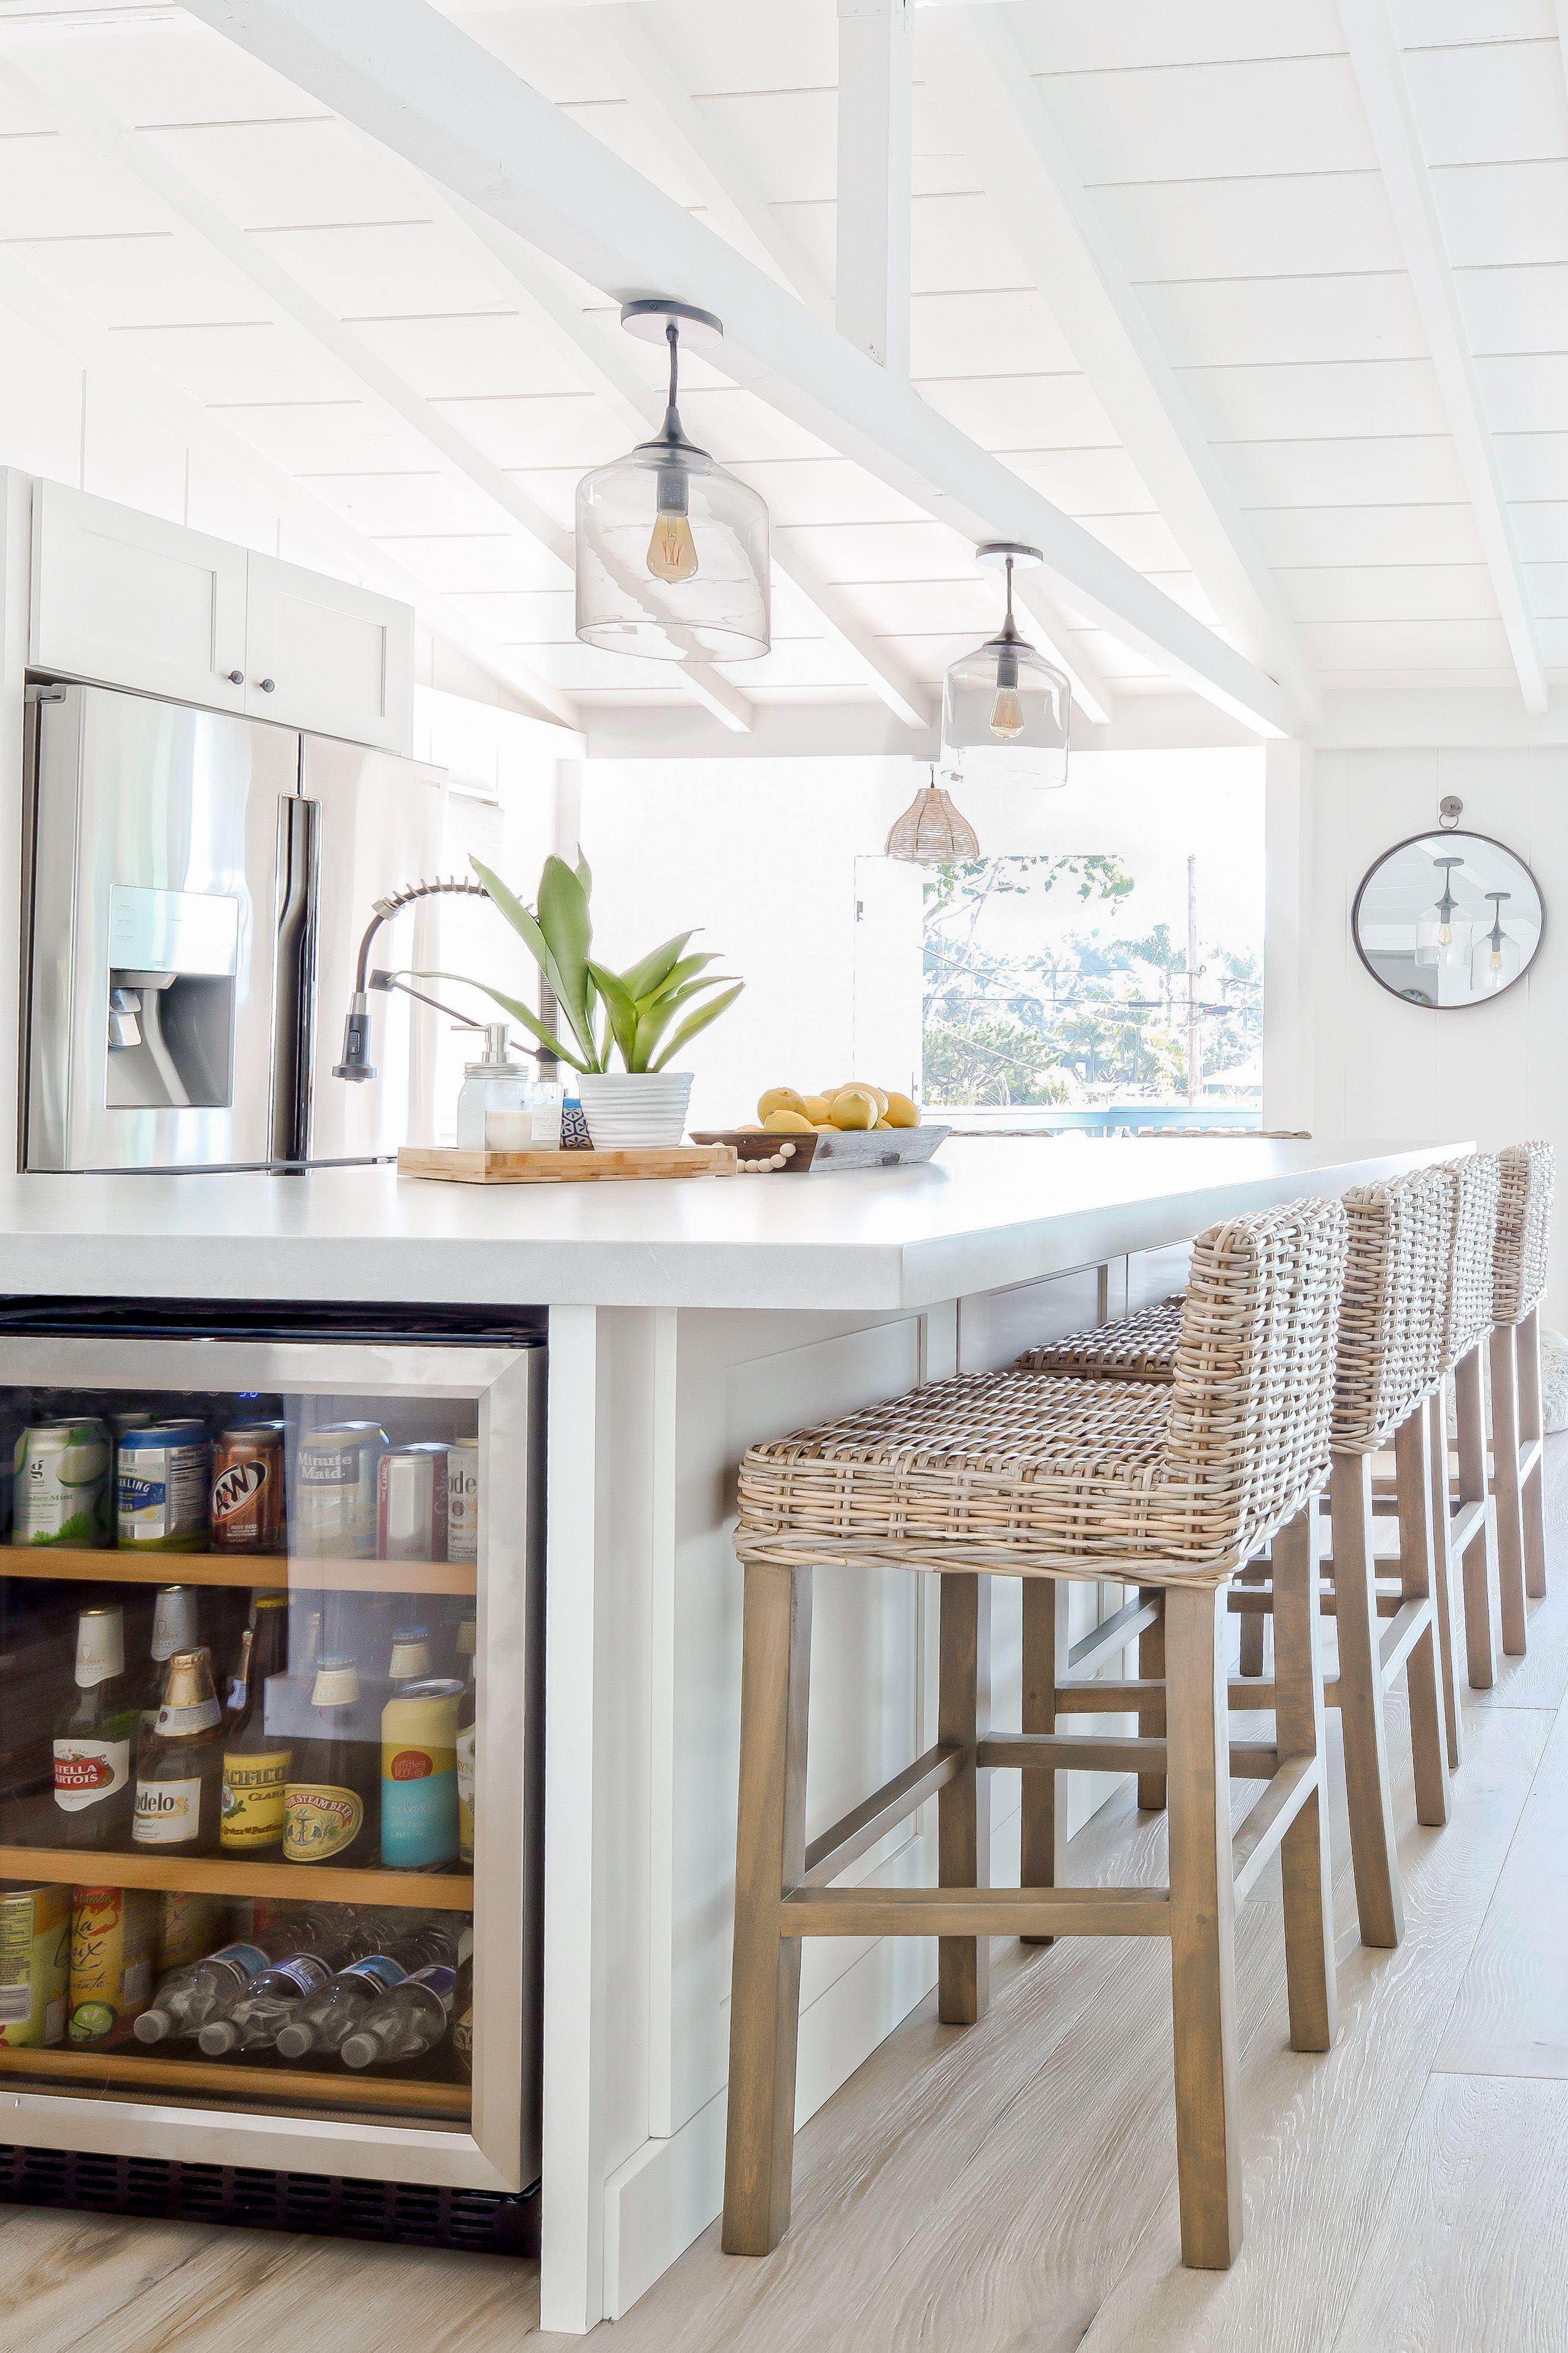 Beachouse in 2020 White kitchen floating shelves, Stools